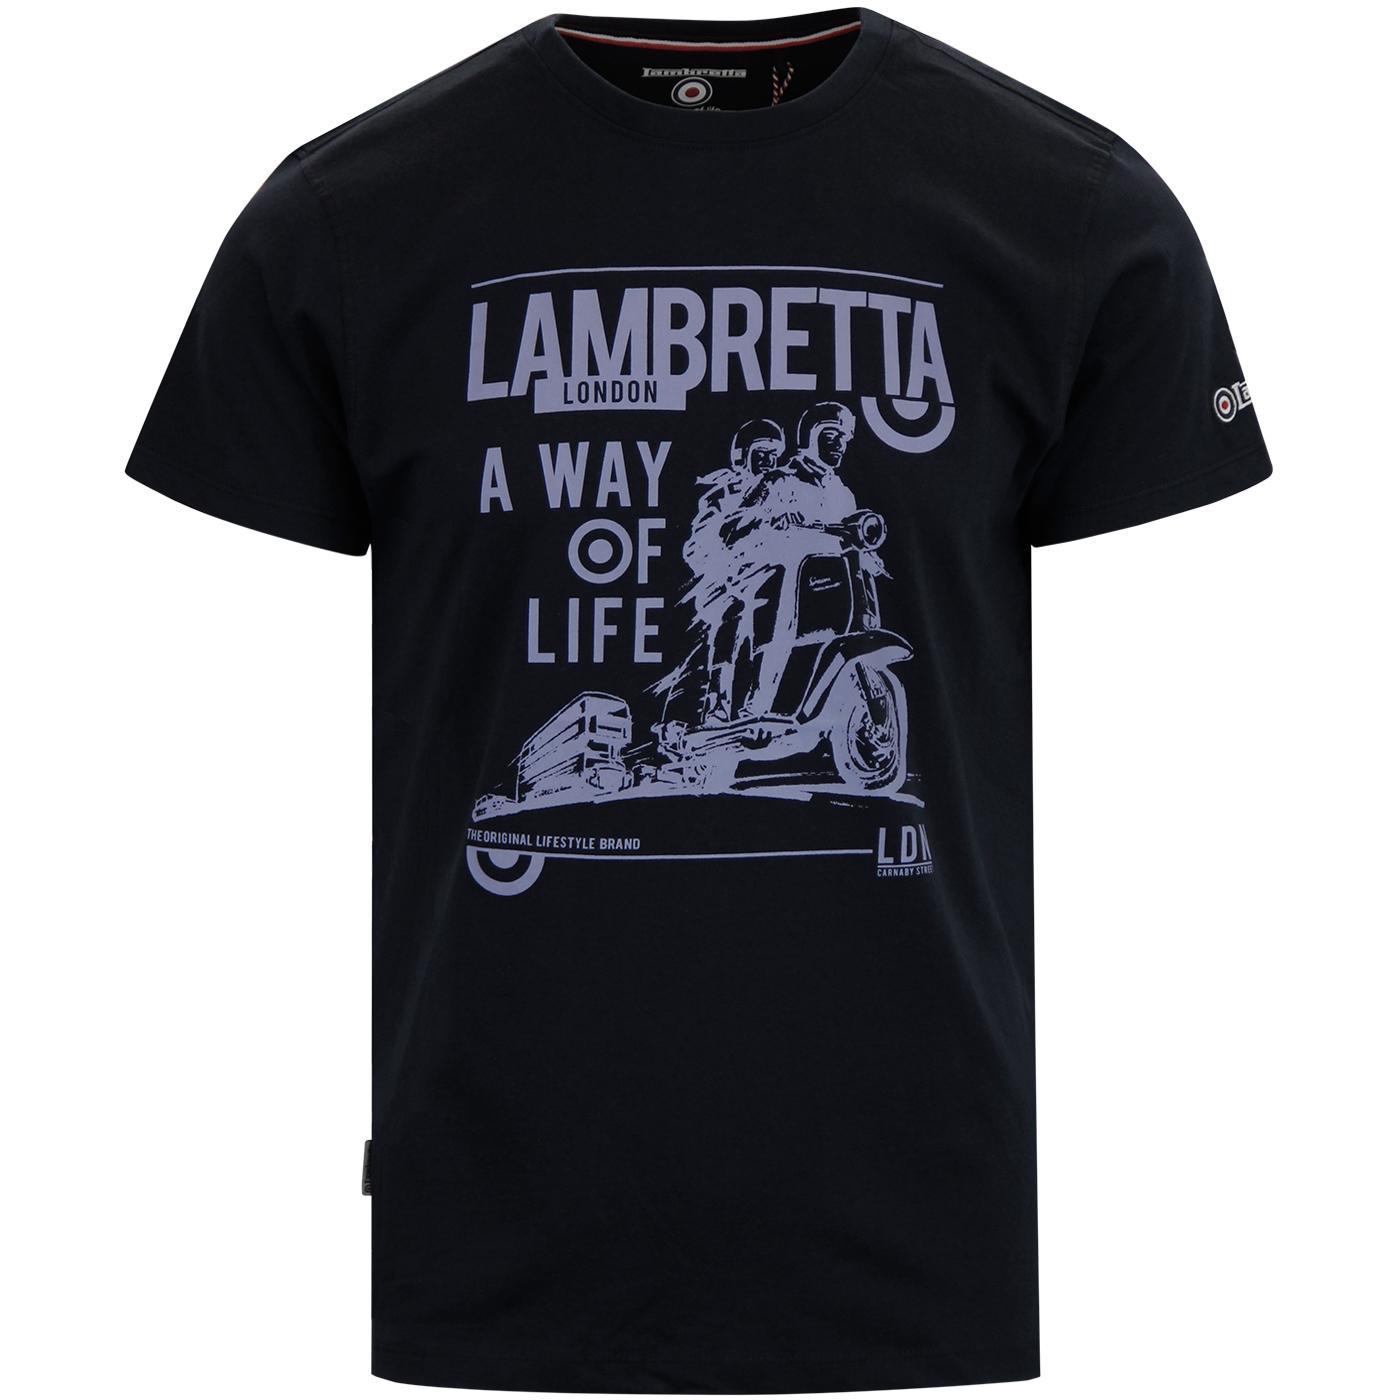 LAMBRETTA 'A Way Of Life' 60's Mod Scooter T-Shirt